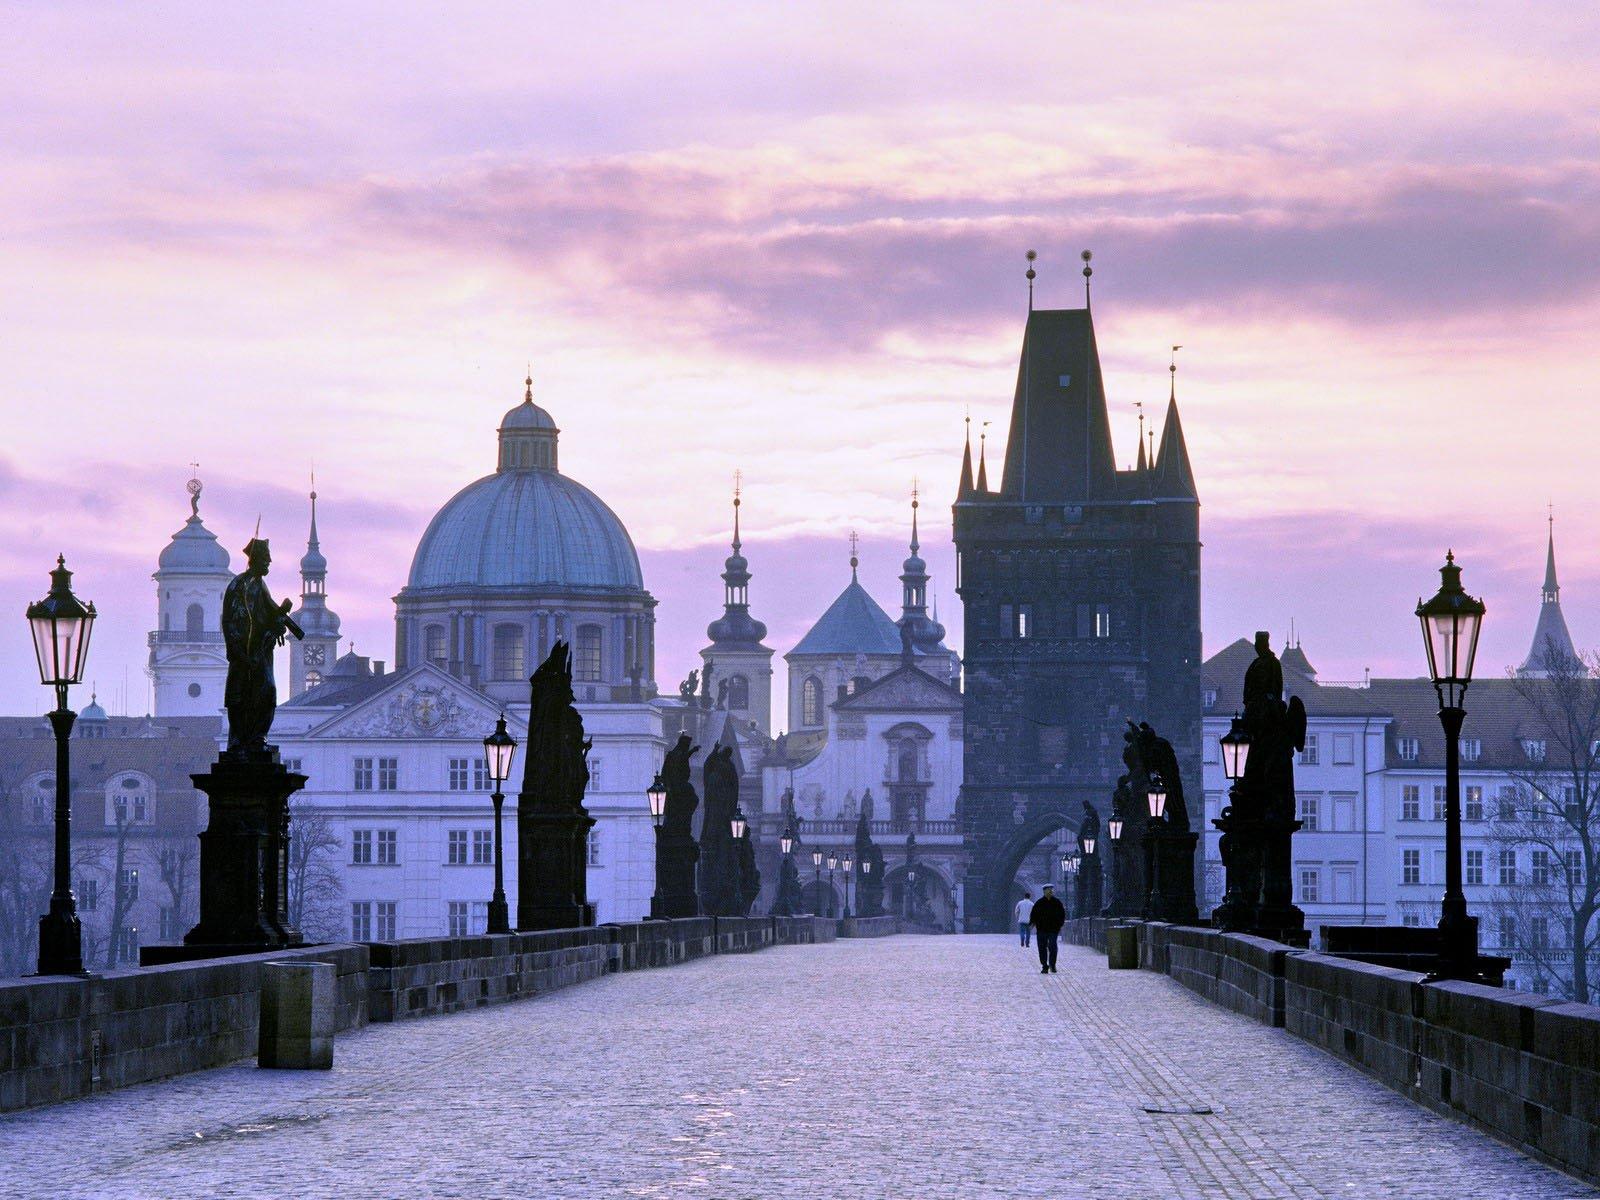 Charles_Bridge_Prague_Wallpaper.jpg?m=1399676400.